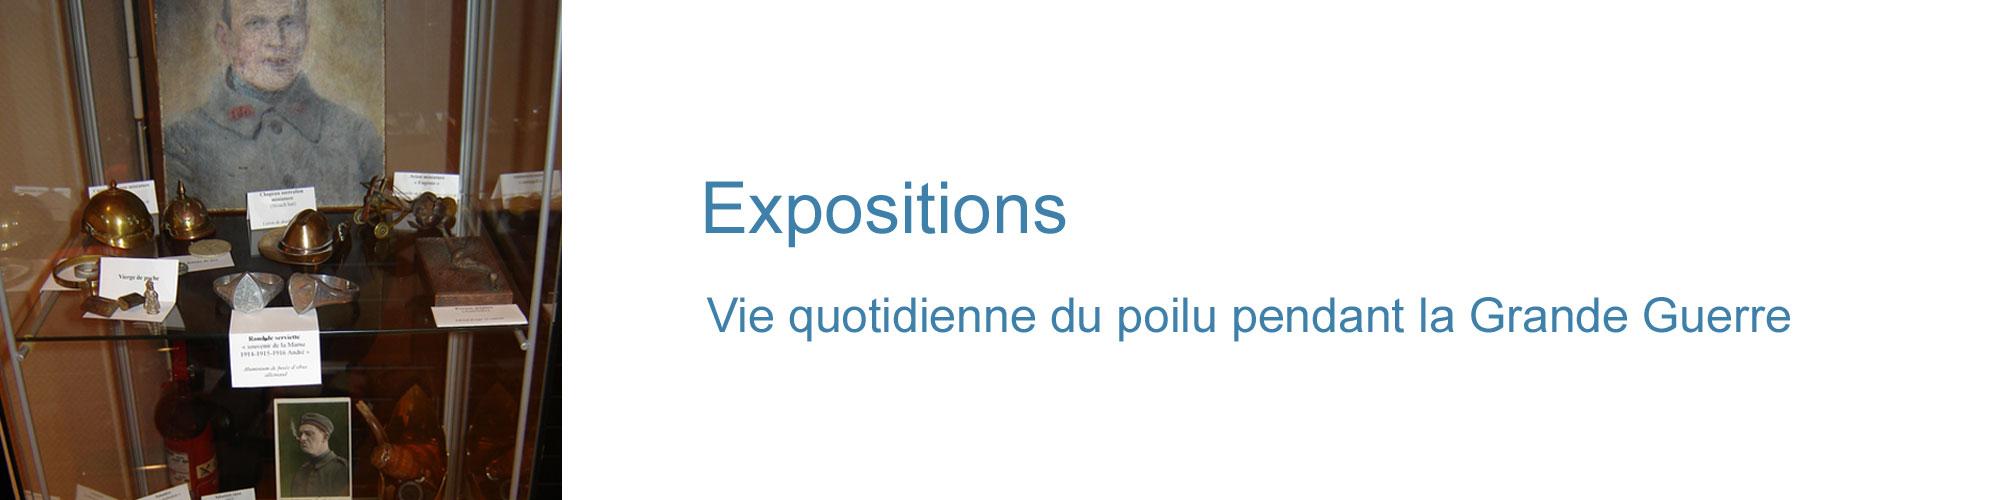 Expositions poilus guerre 14-18